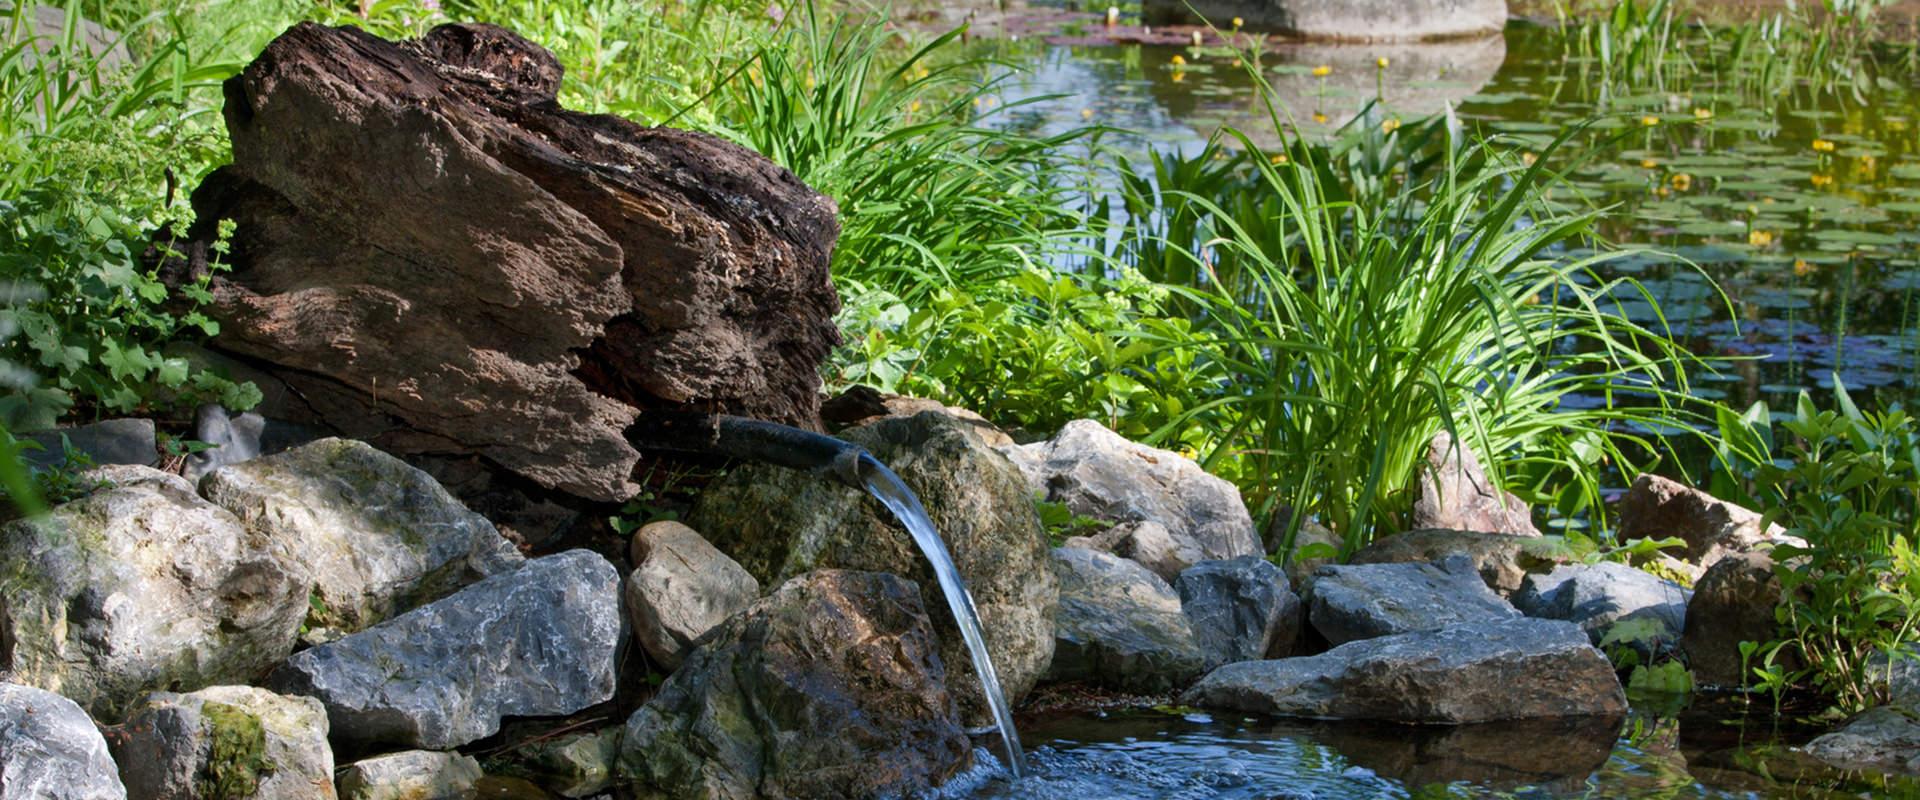 Feldmann Gartenbau harry feldmann gartenbau landschaftsbau pflanzarbeiten